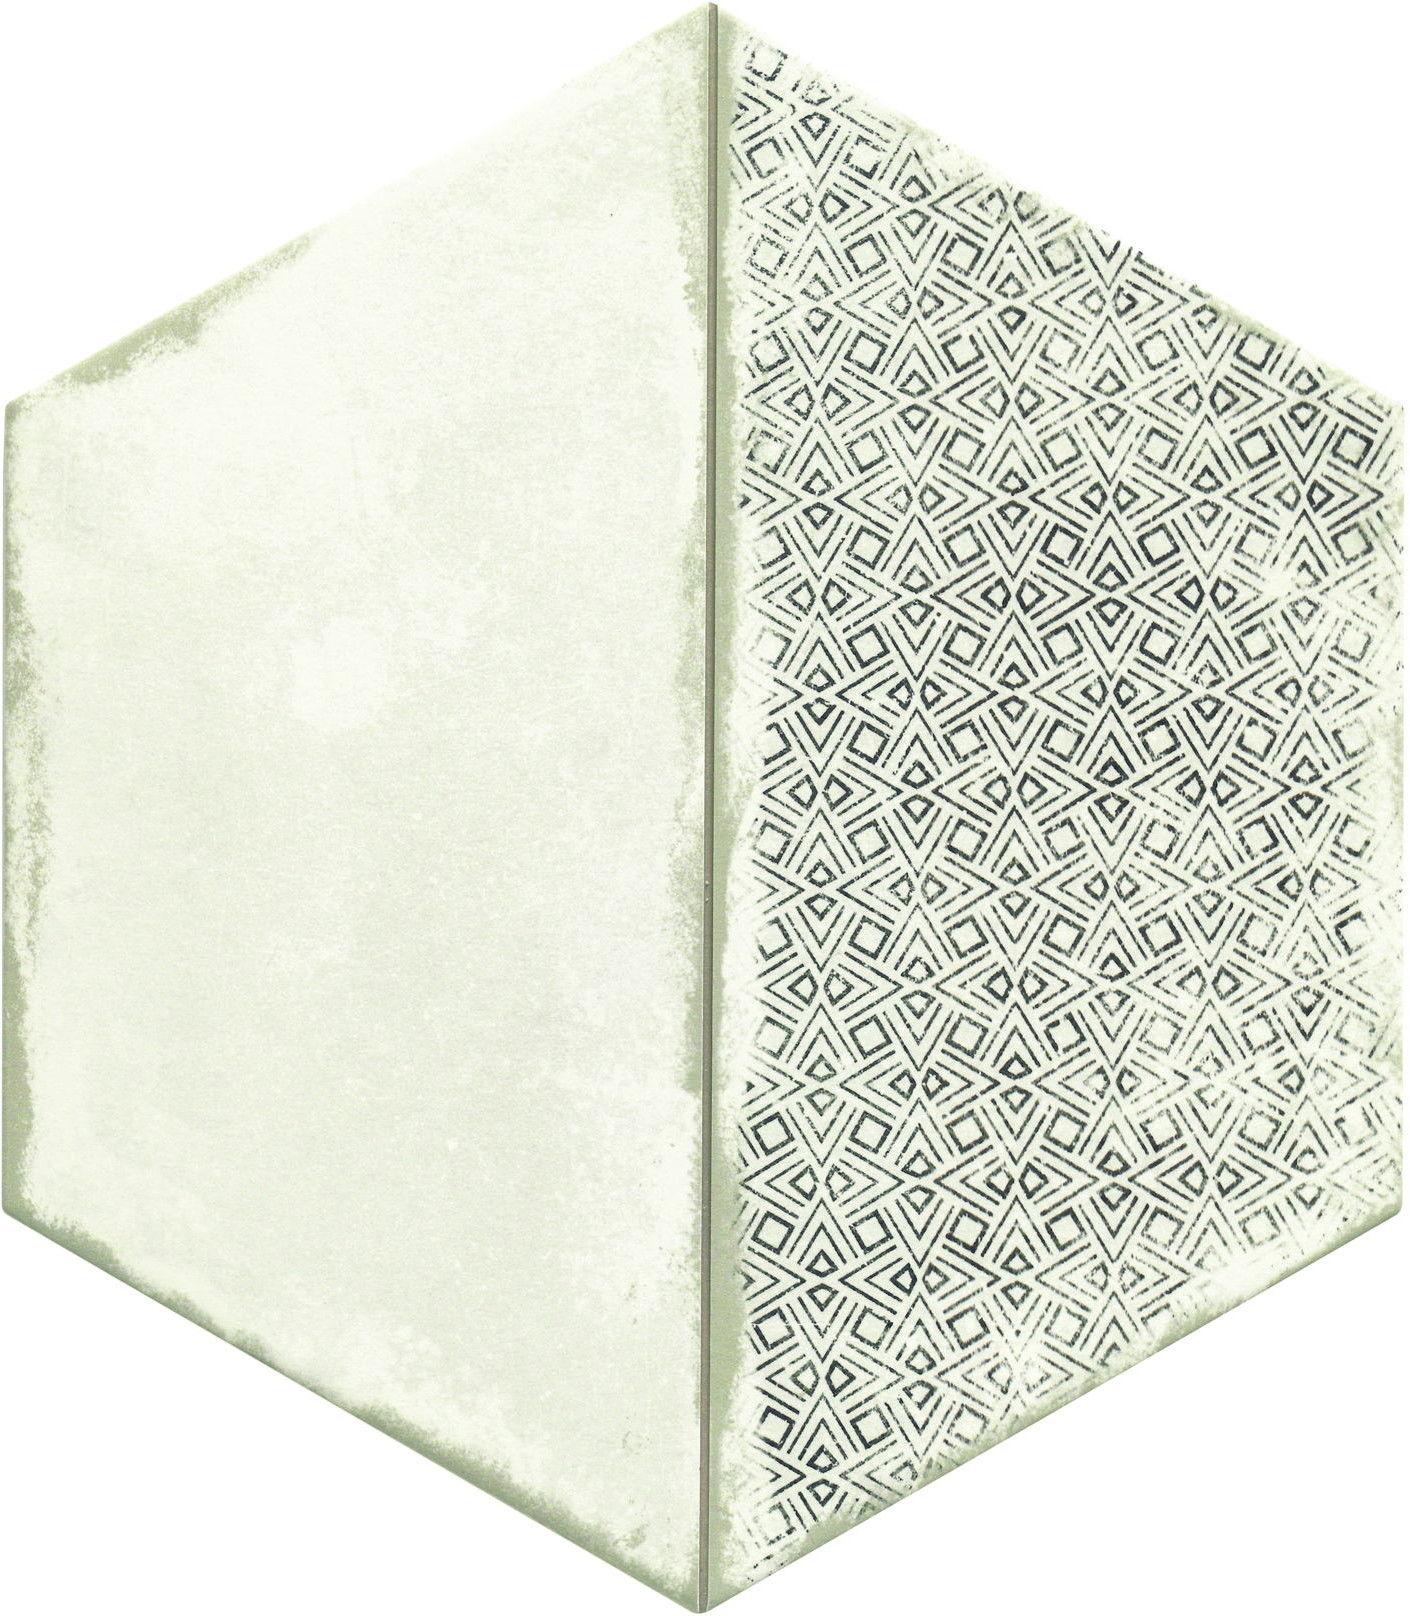 Trapez Vintage Deco 28,5x33 płytki heksagonalne